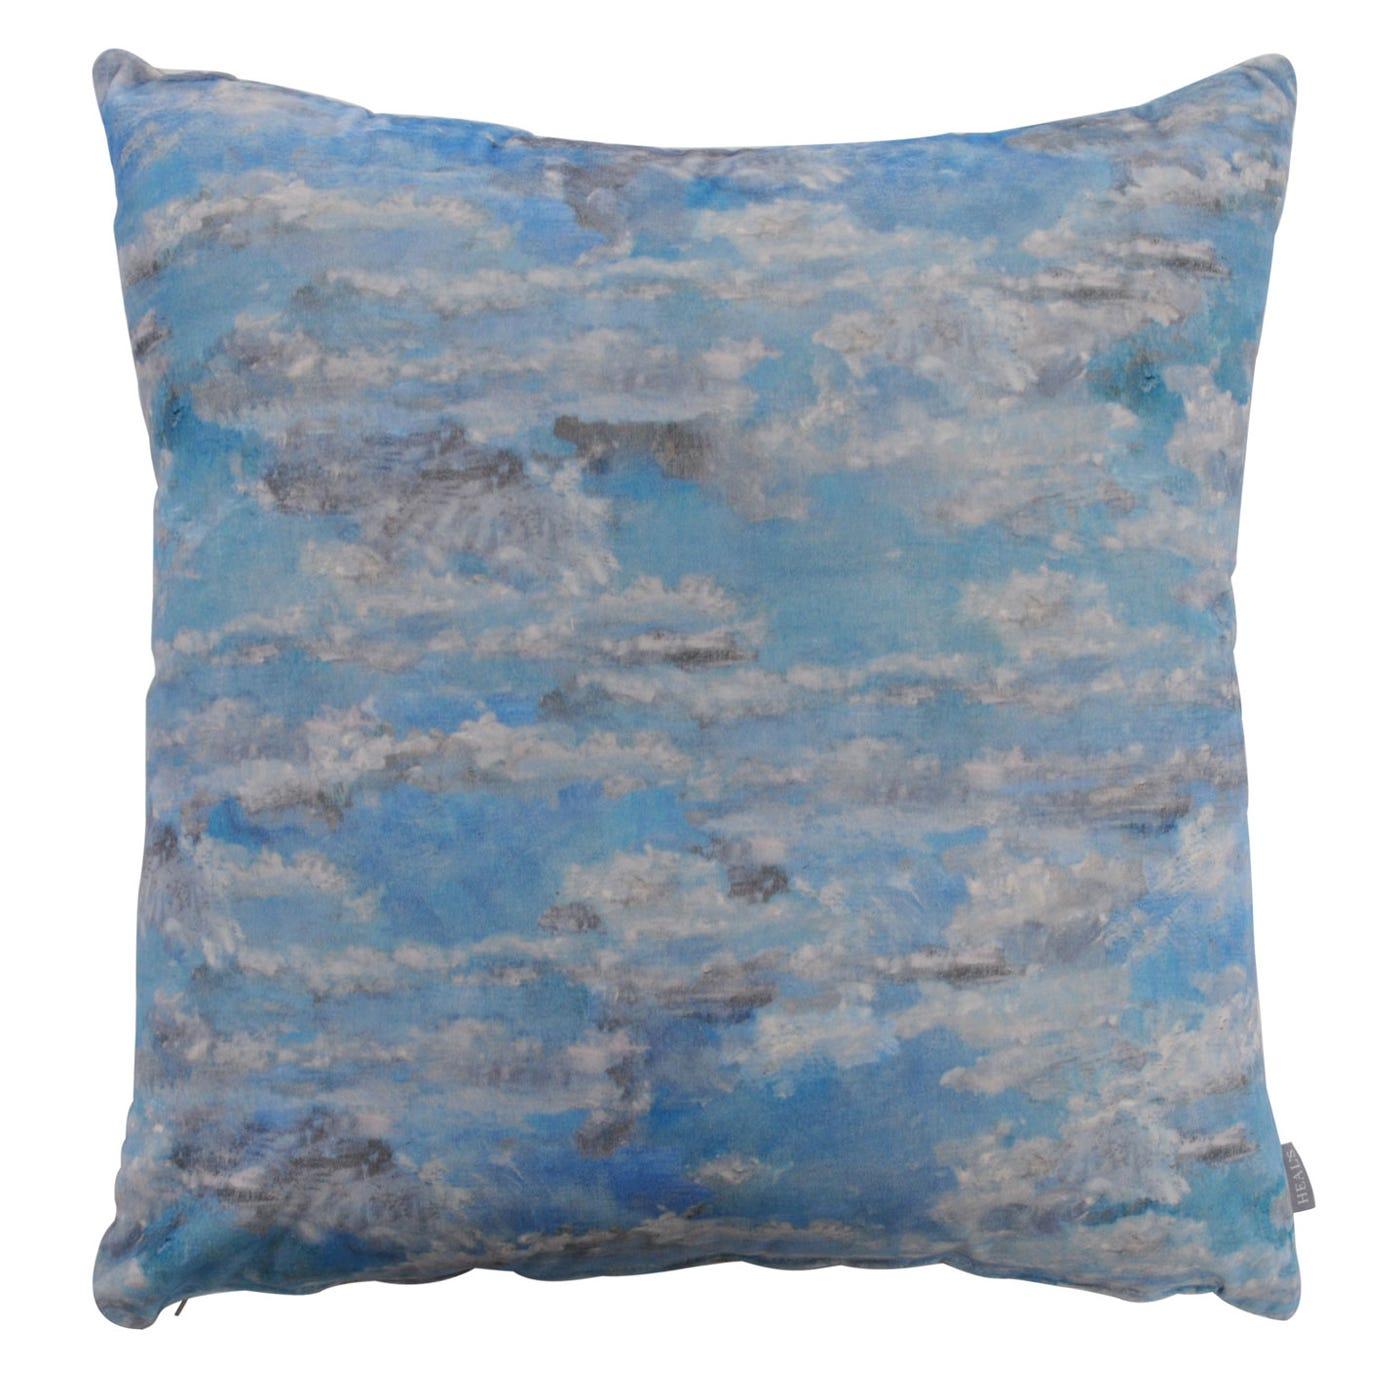 Large Cloud Study Cushion